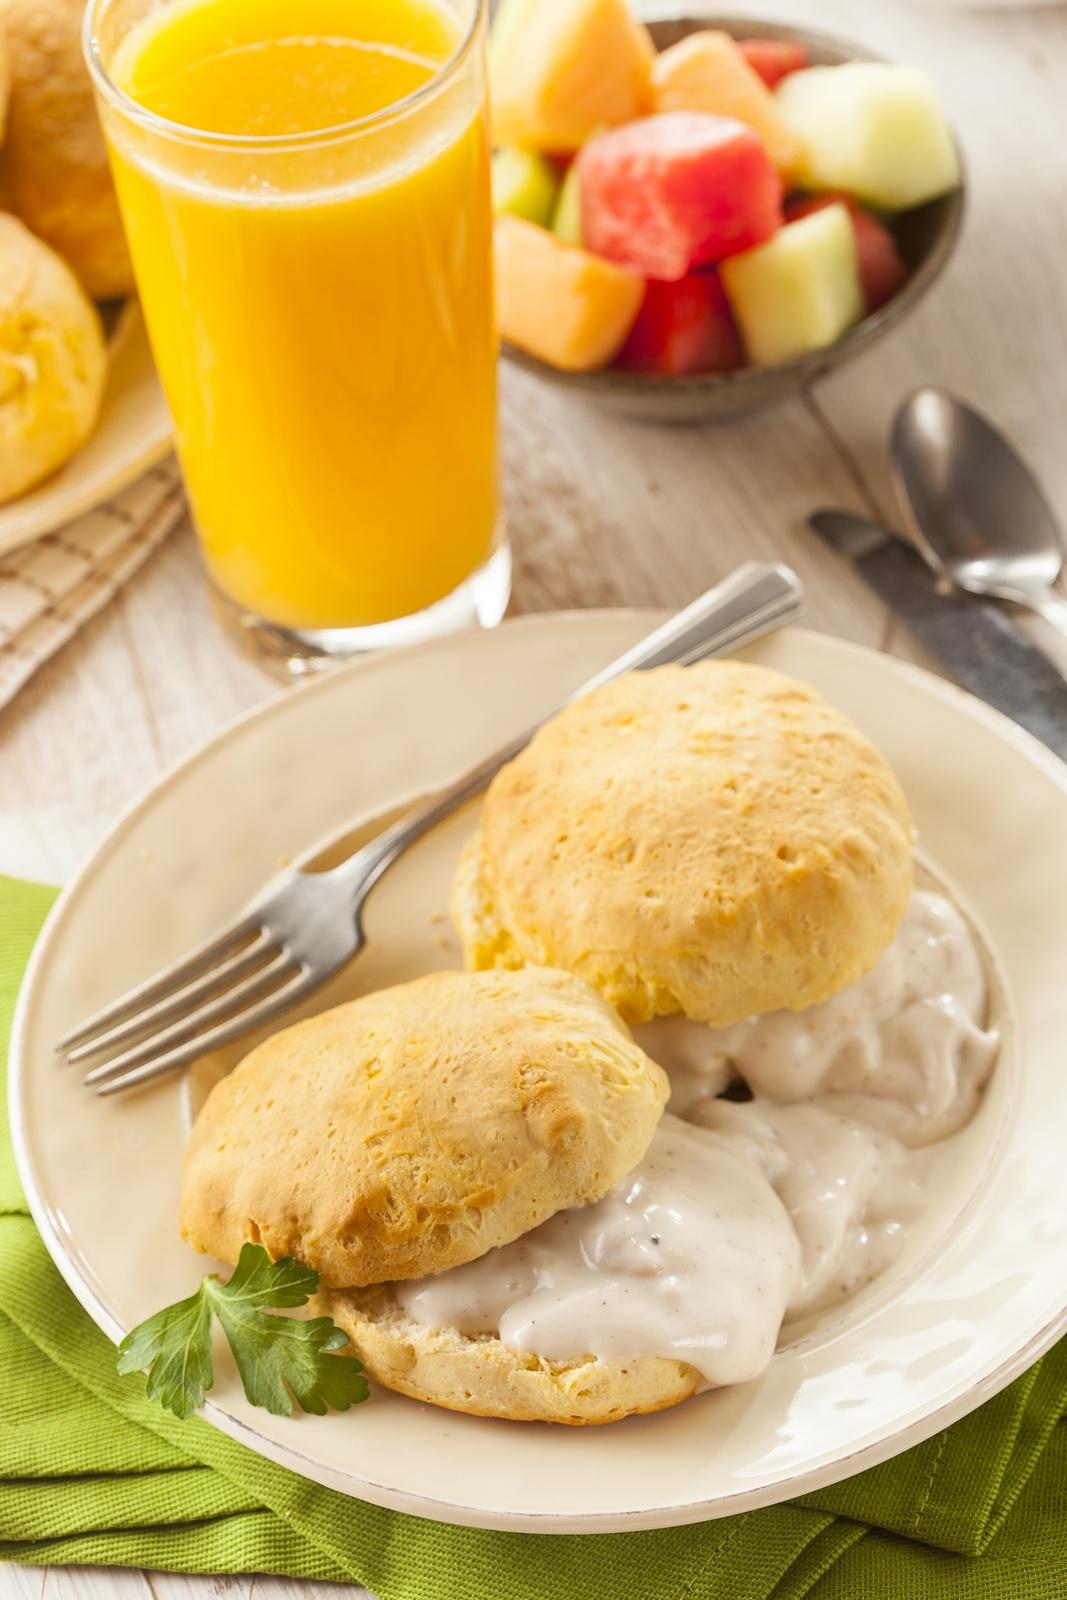 bigstock-Homemade-Buttermilk-Biscuits-A-56579693.jpg